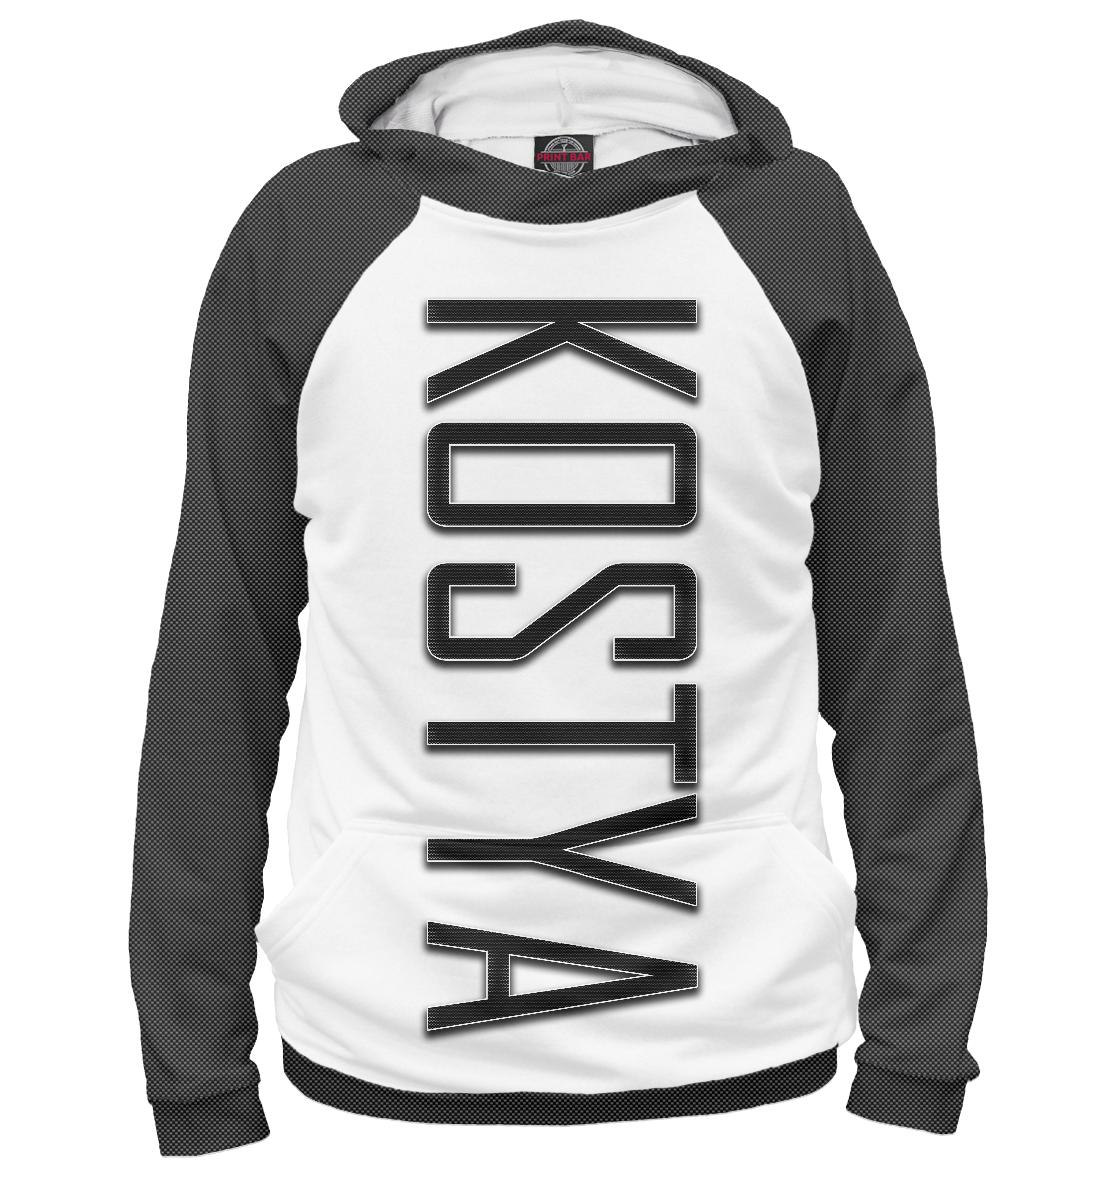 Купить Kostya-carbon, Printbar, Худи, KST-728461-hud-1